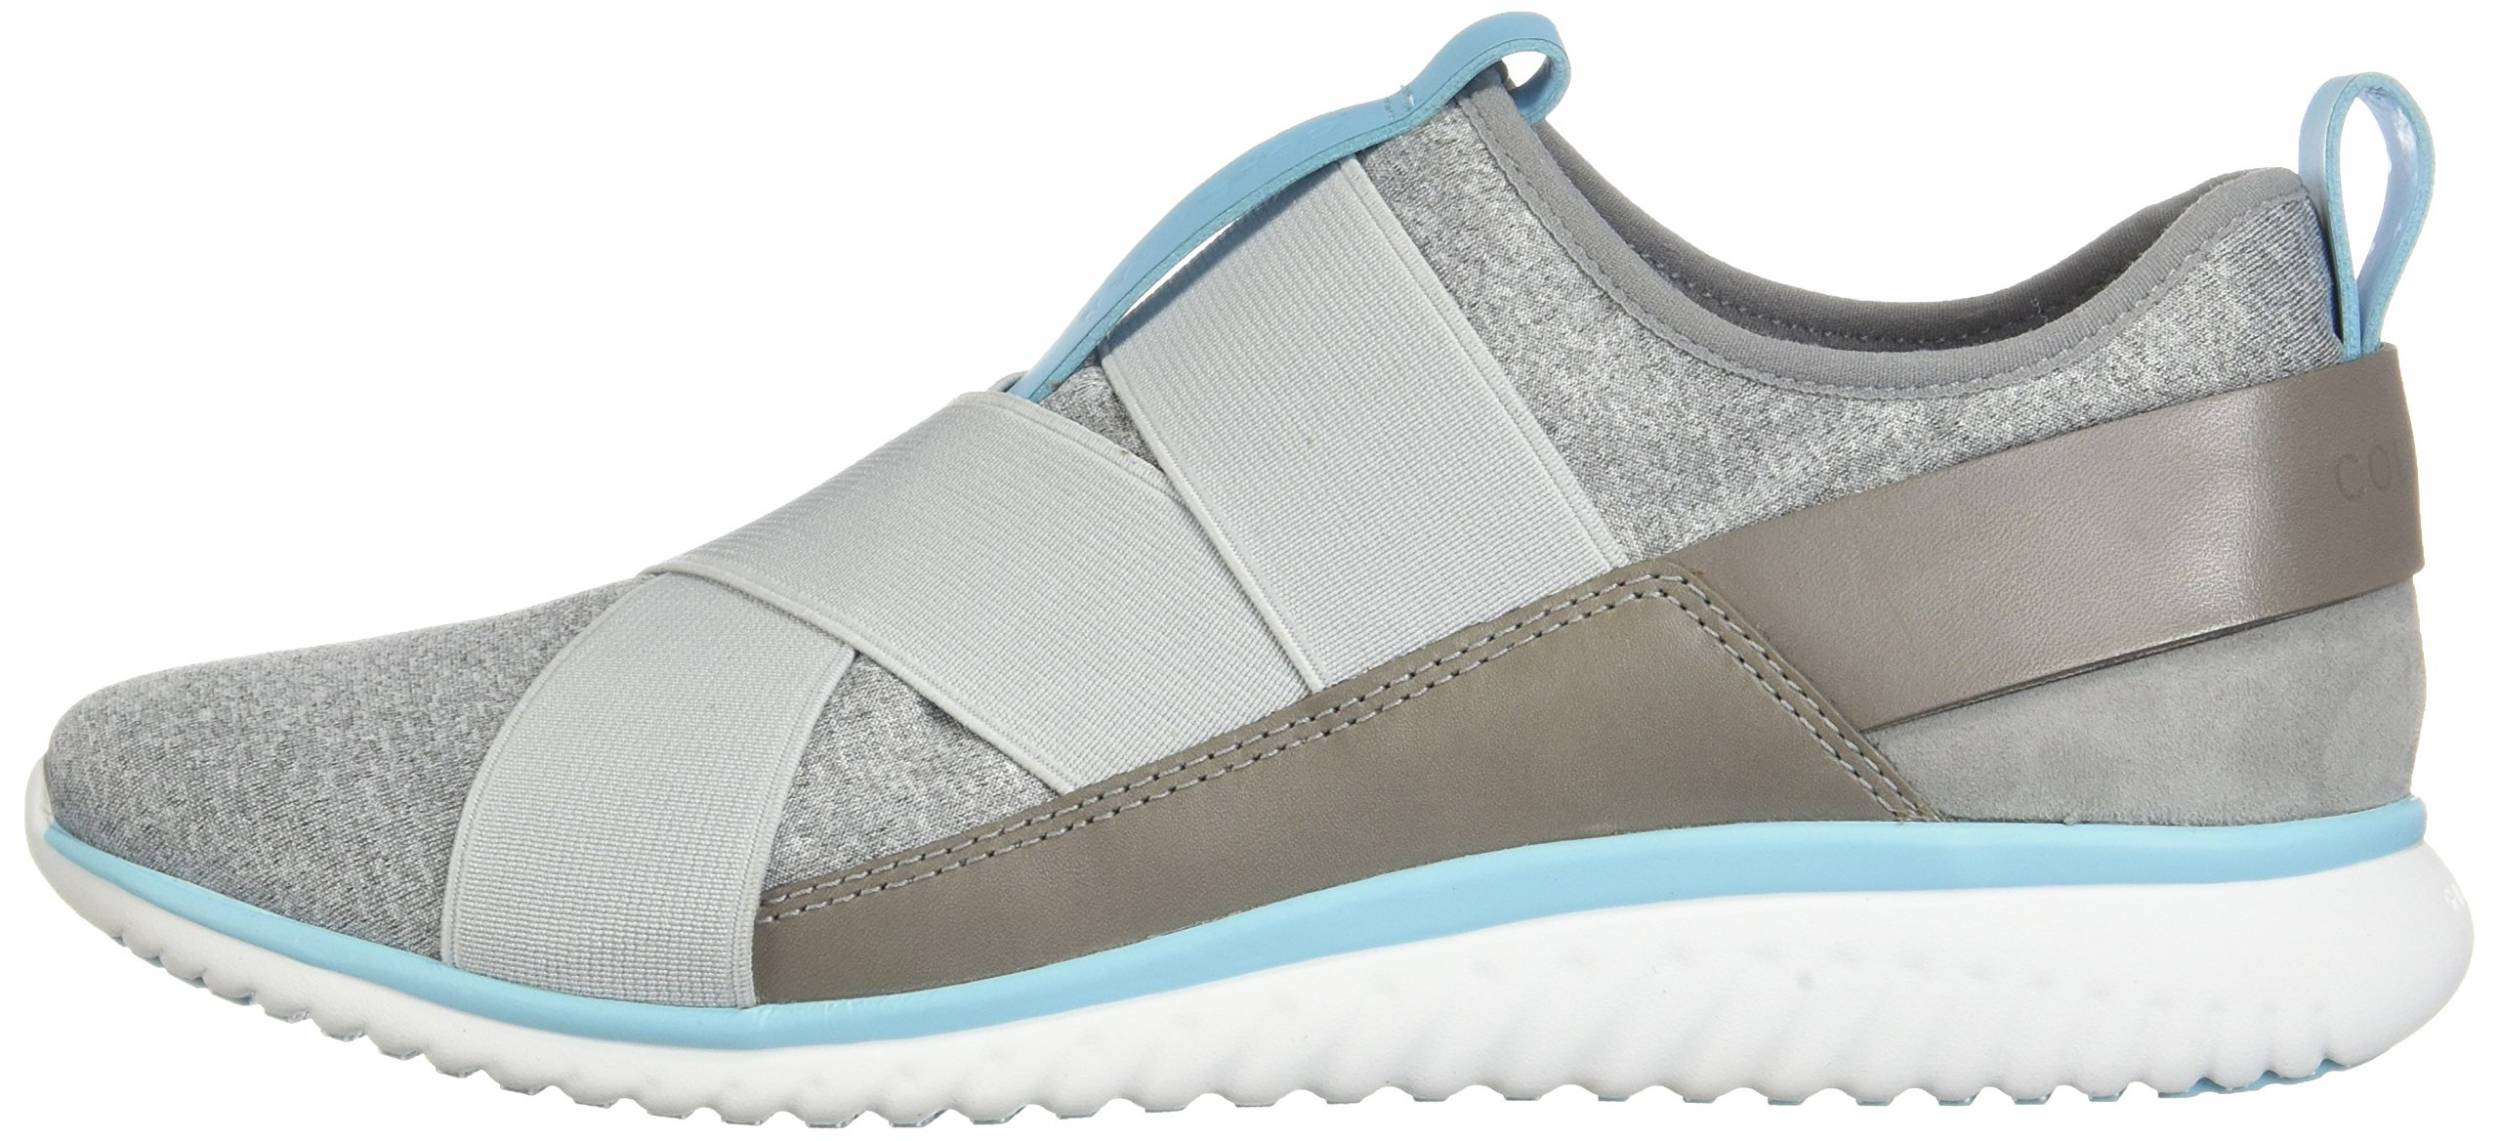 Cole Haan StudioGrand Knit Sneaker